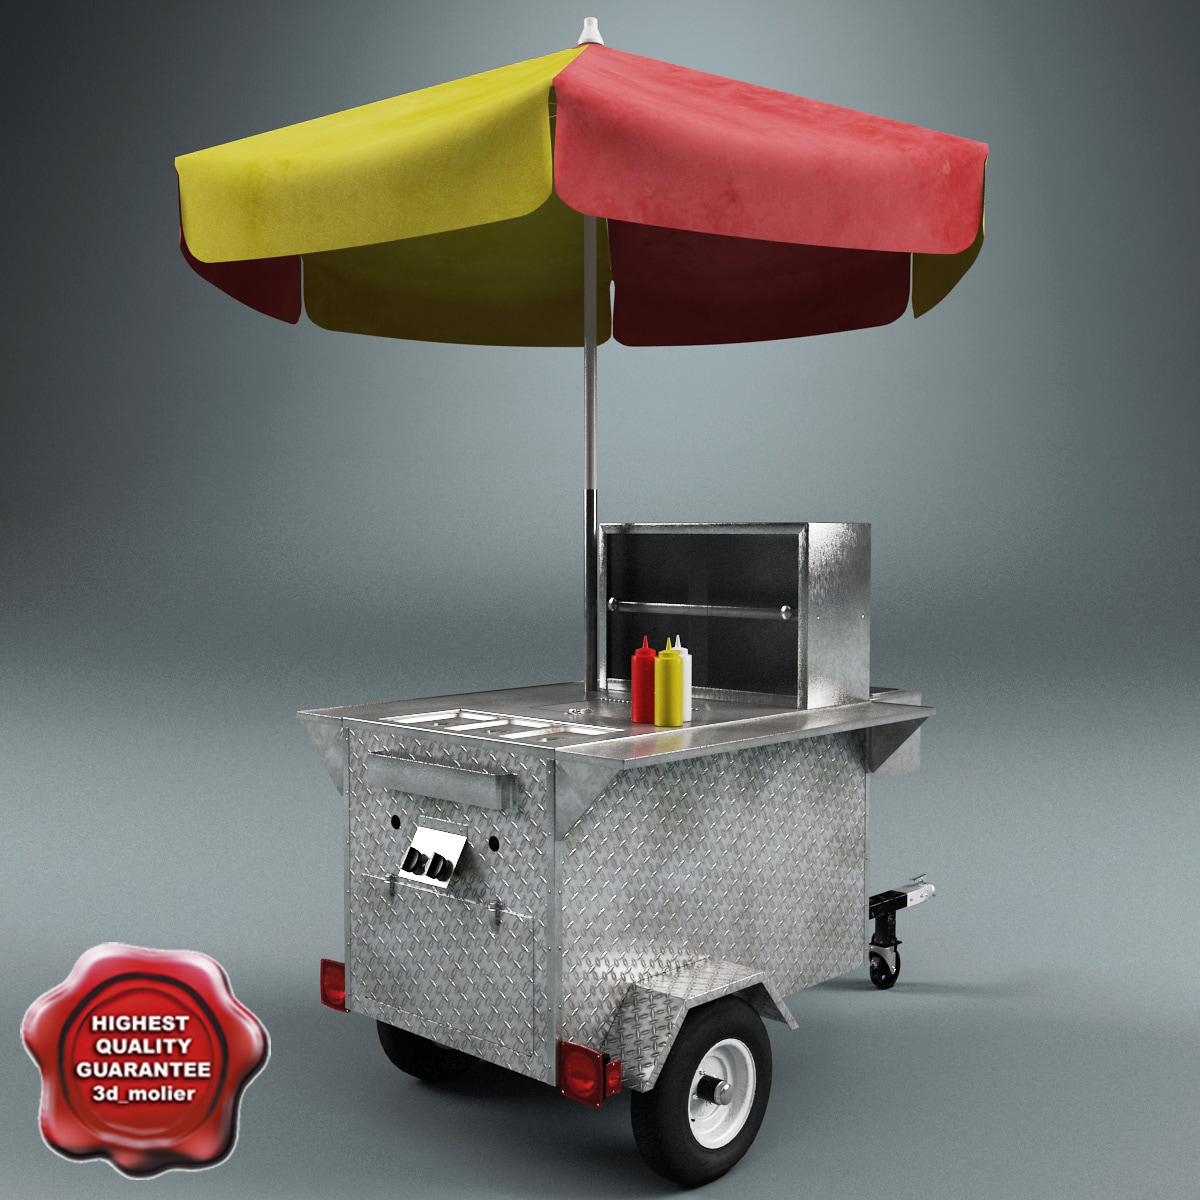 Hot_Dog_Cart_V2_00.jpg